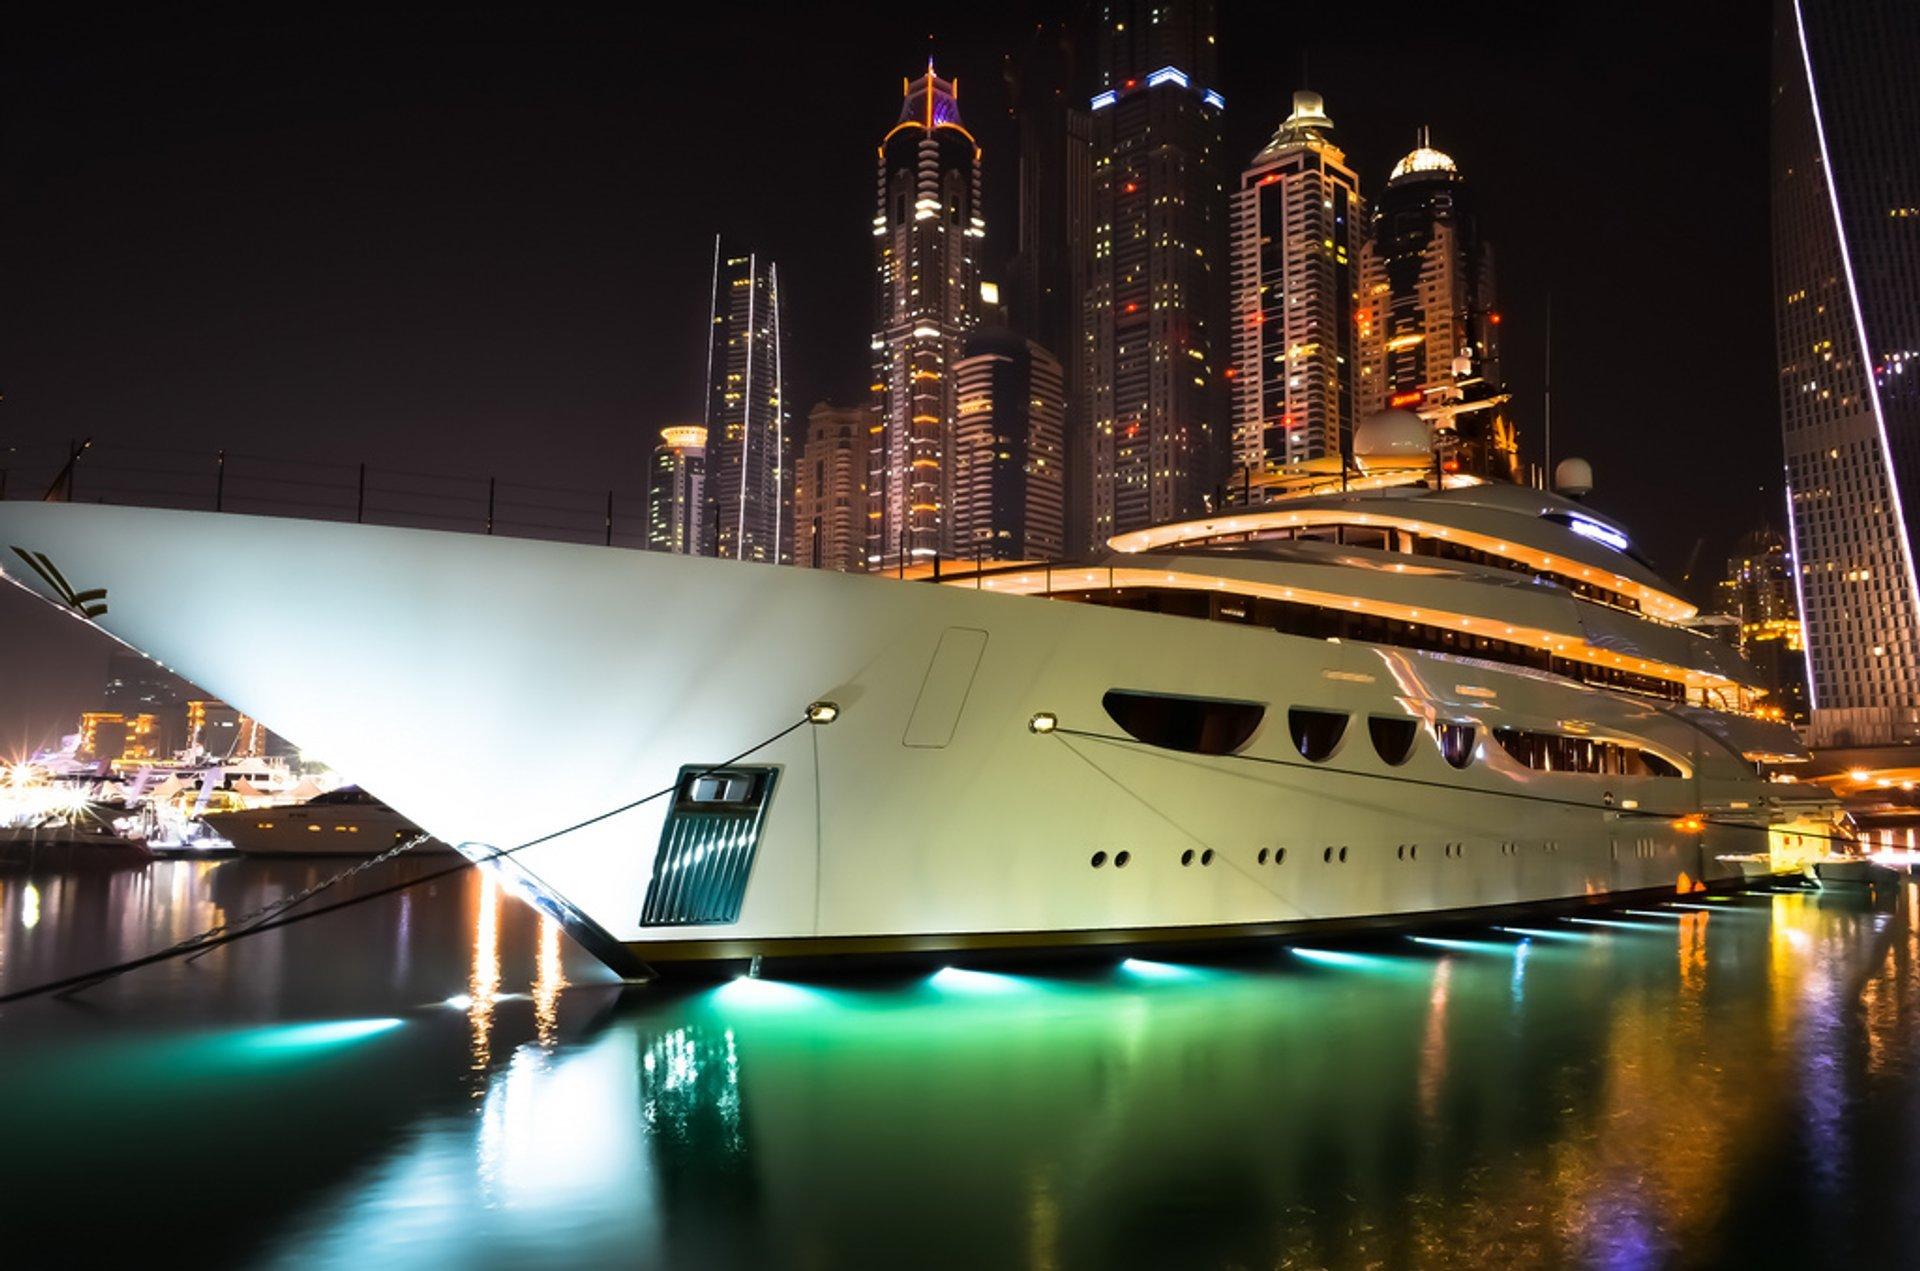 Dubai International Boat Show in Dubai 2019 - Best Time